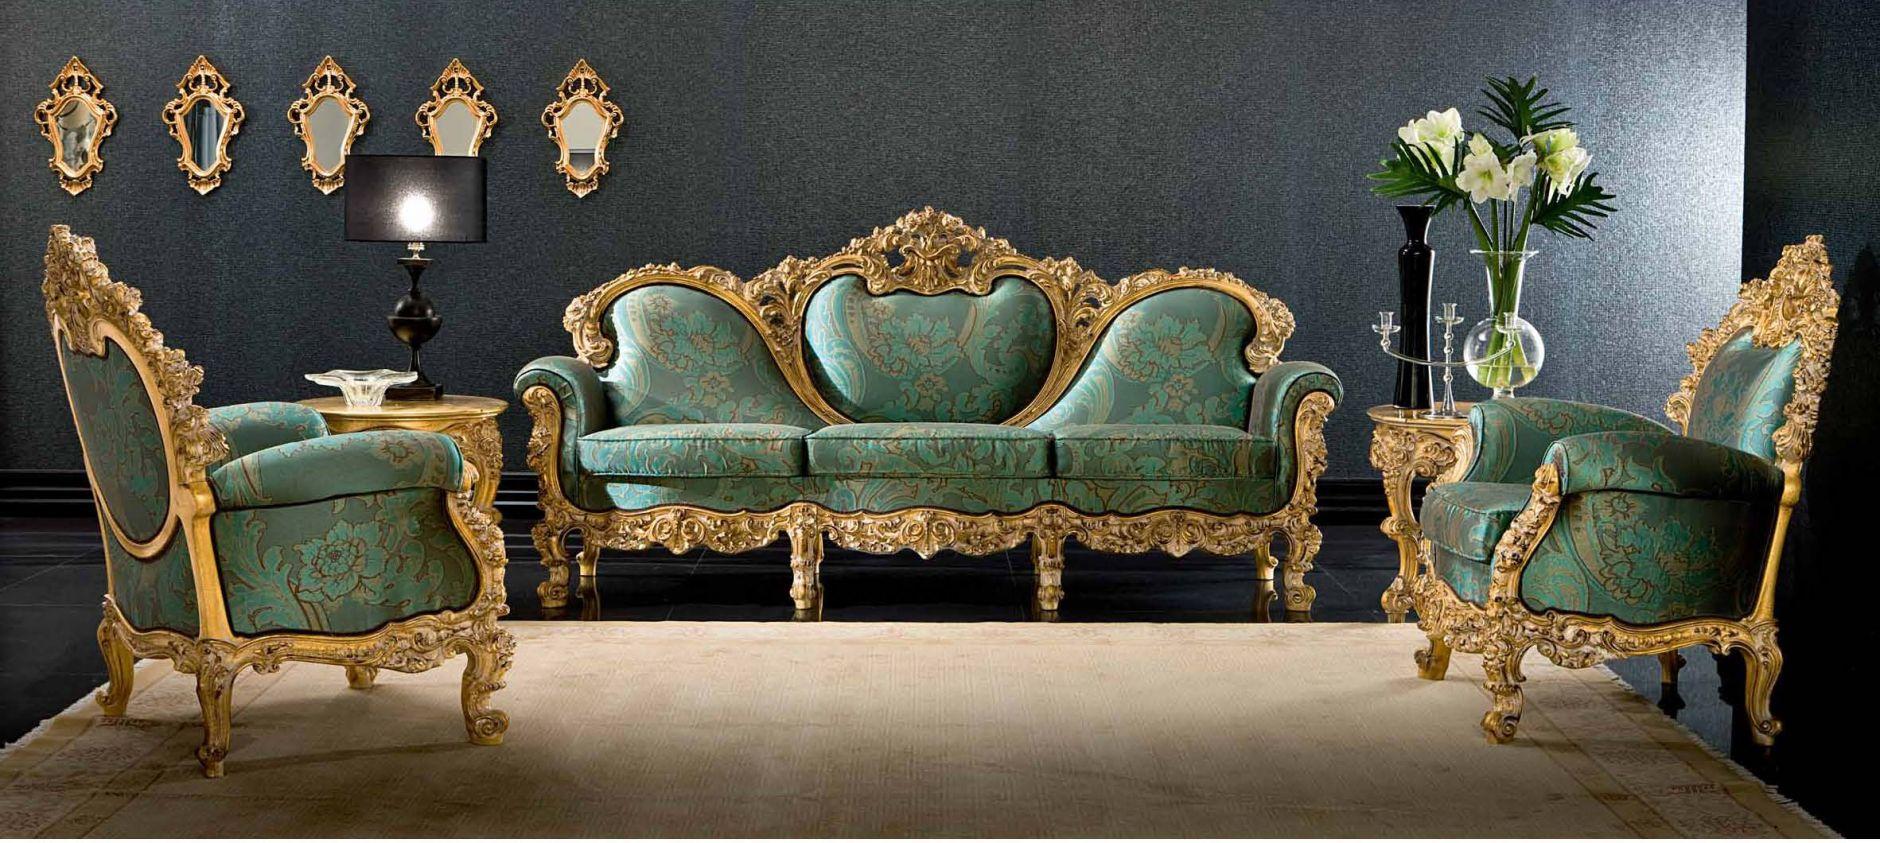 luxus-möbel - luxus möbel serie silik plutonedie möbel aus italien, Hause ideen